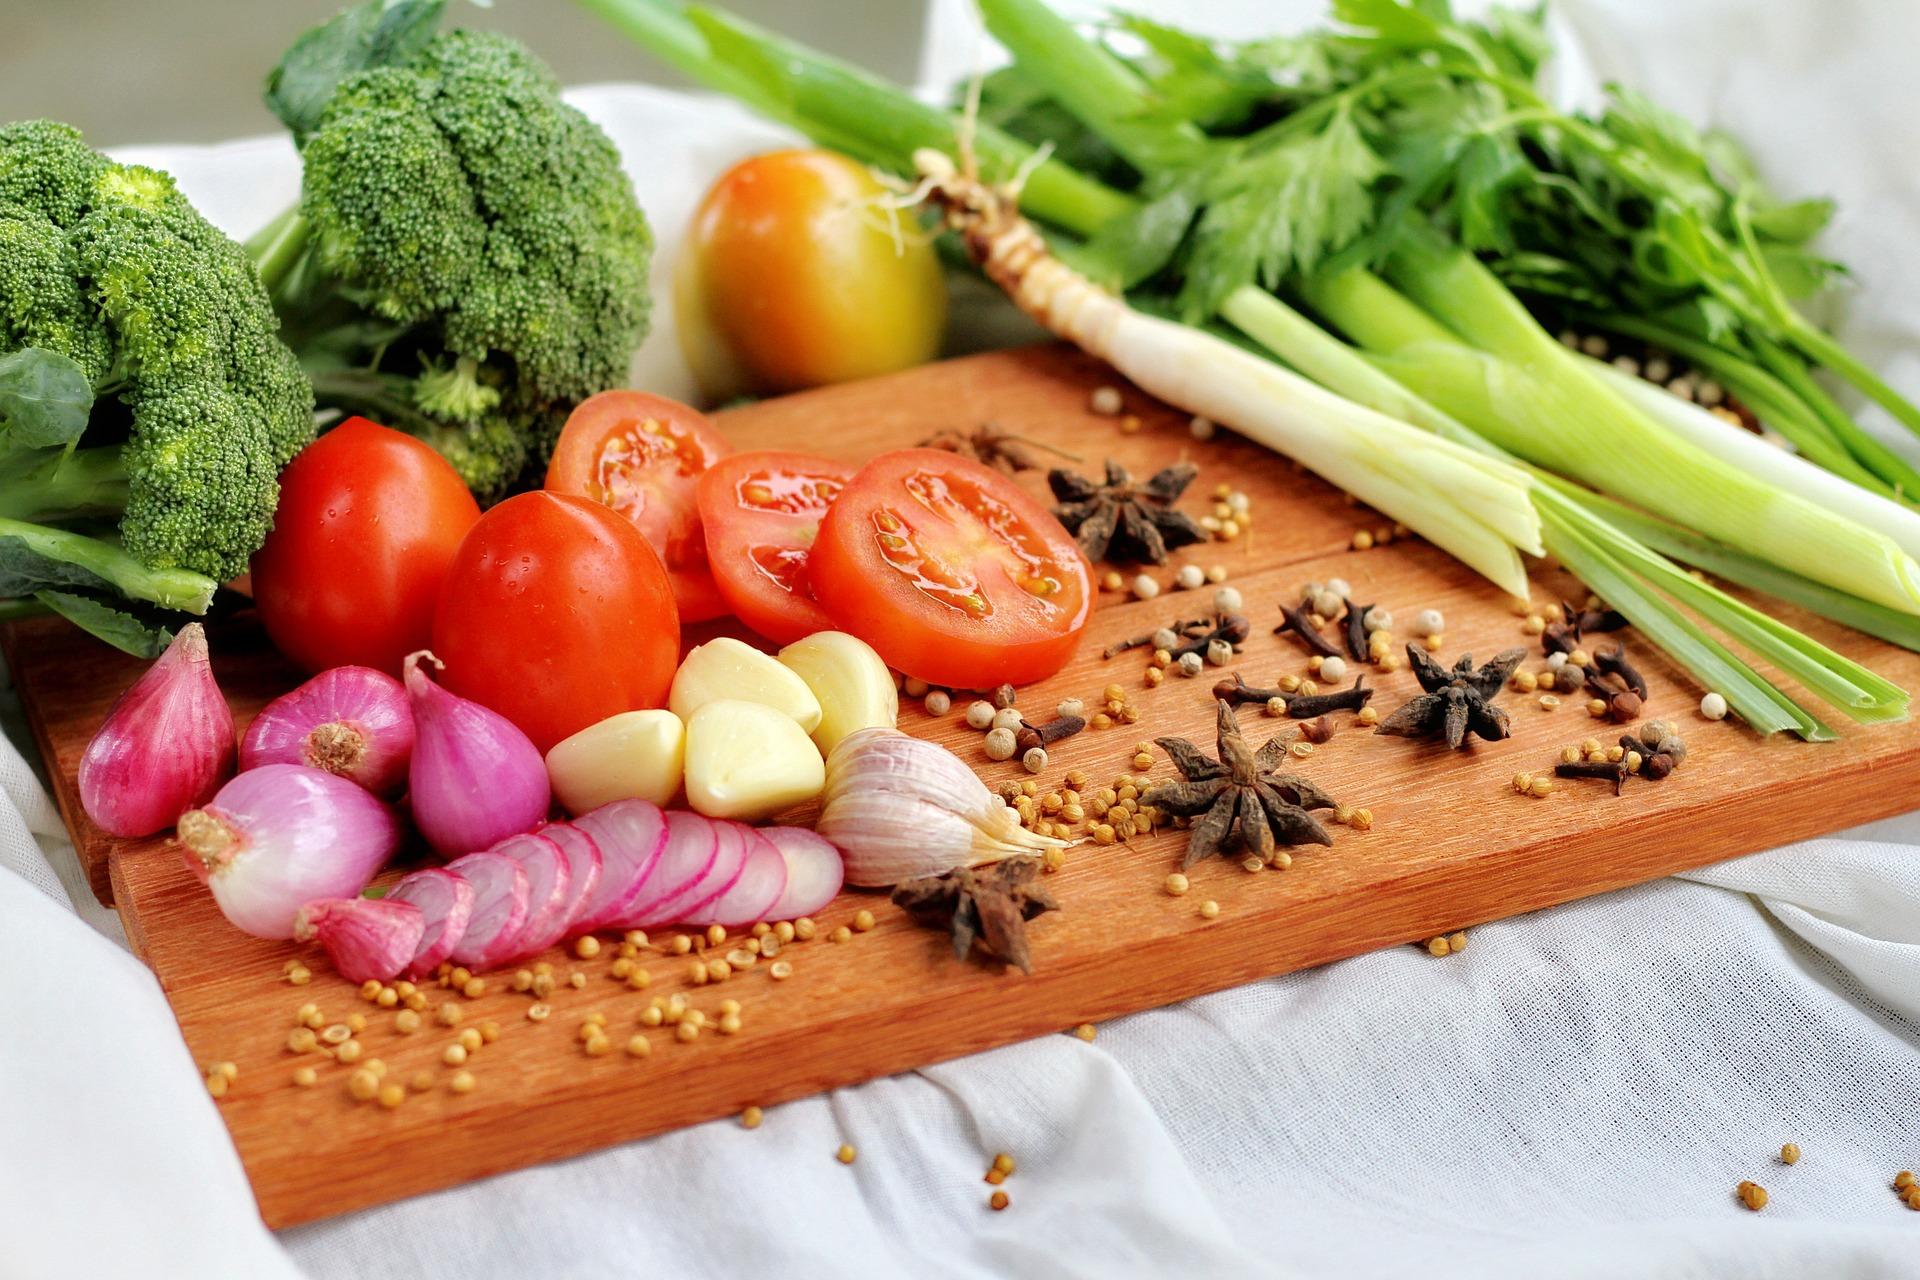 vegan fad diet impact on farmers